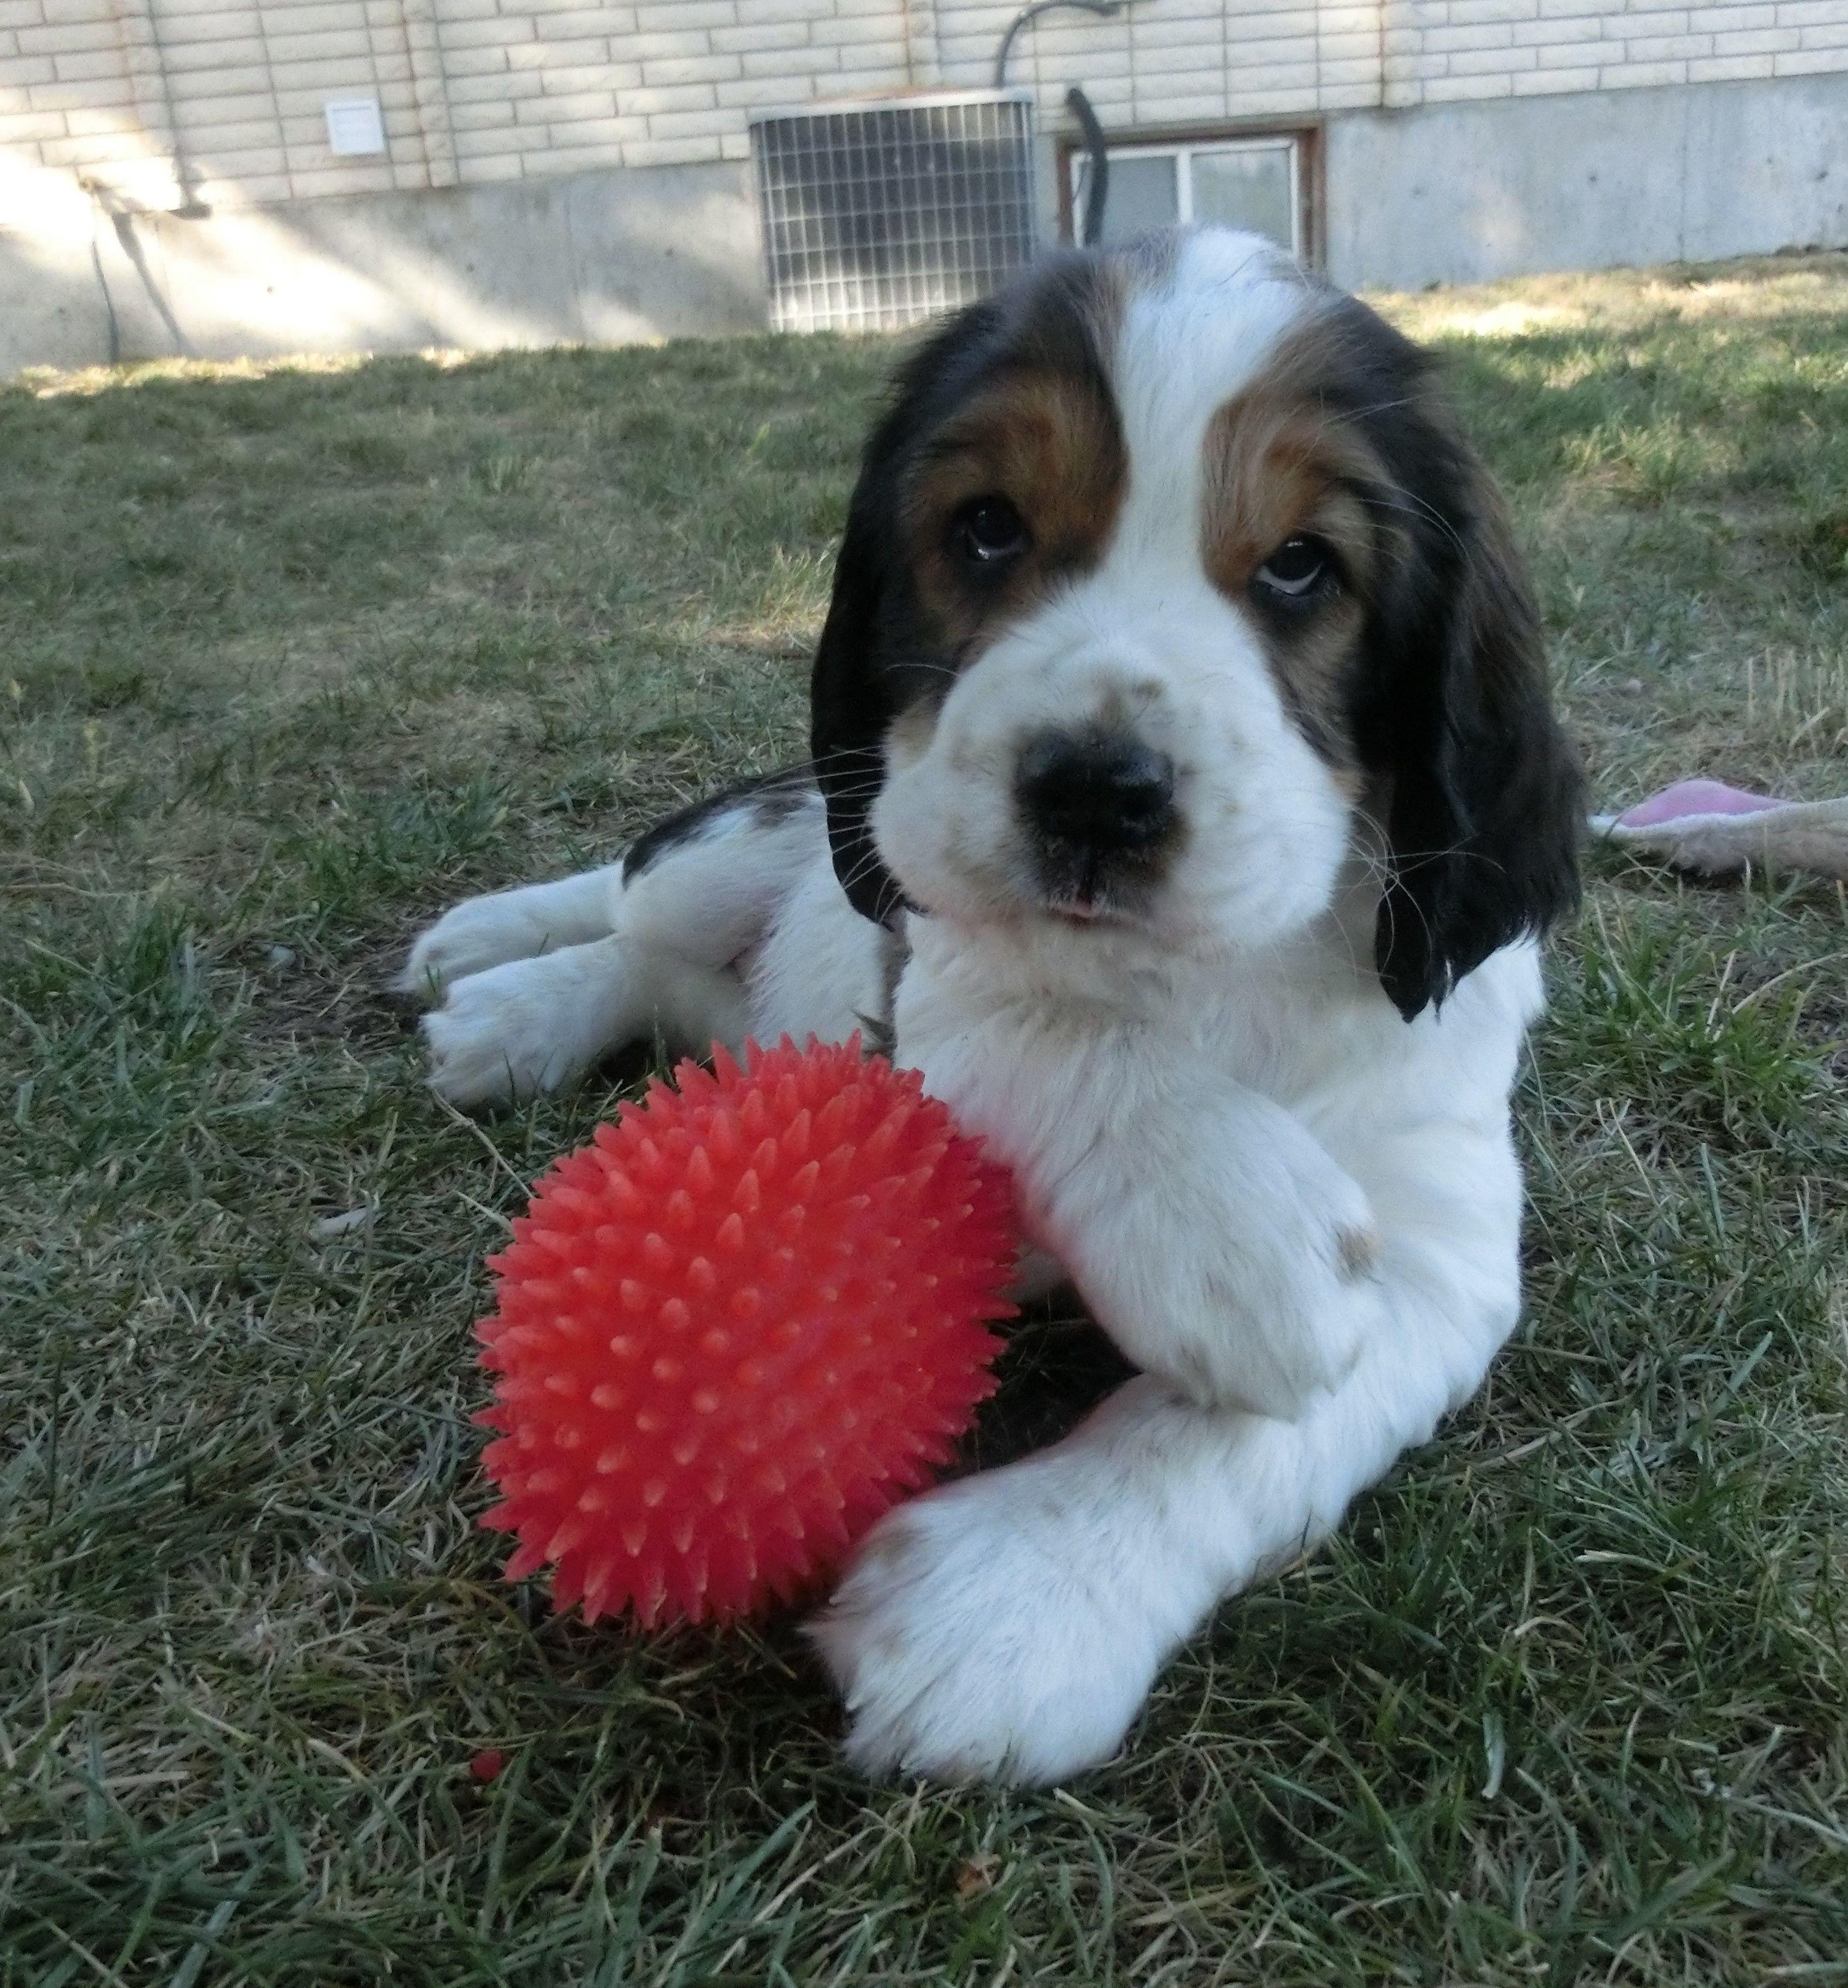 English Springer Spaniel puppy image 1